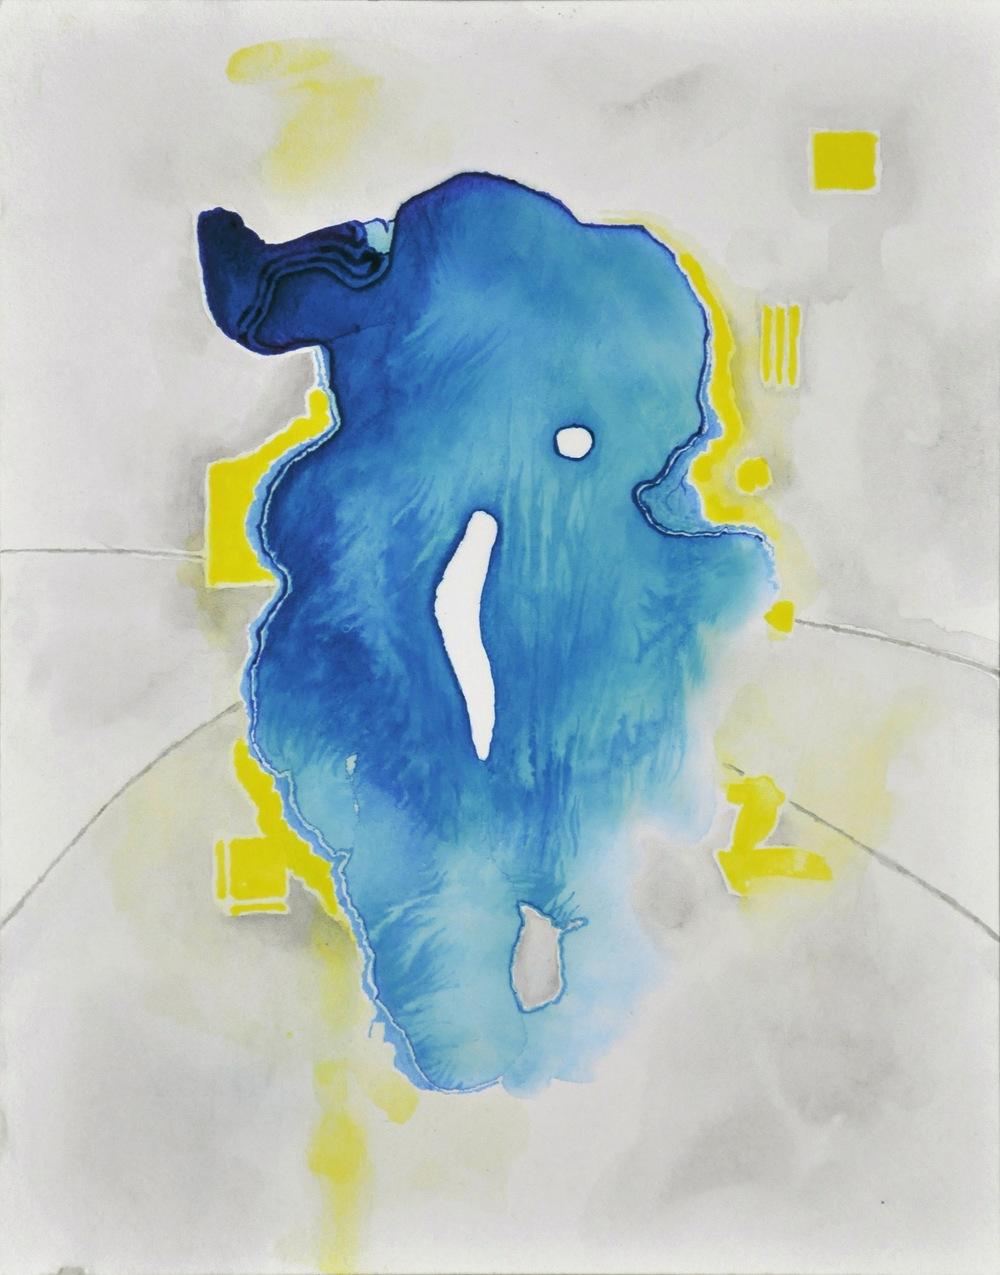 Meditation (Paehama Phusati - first touch), 2015